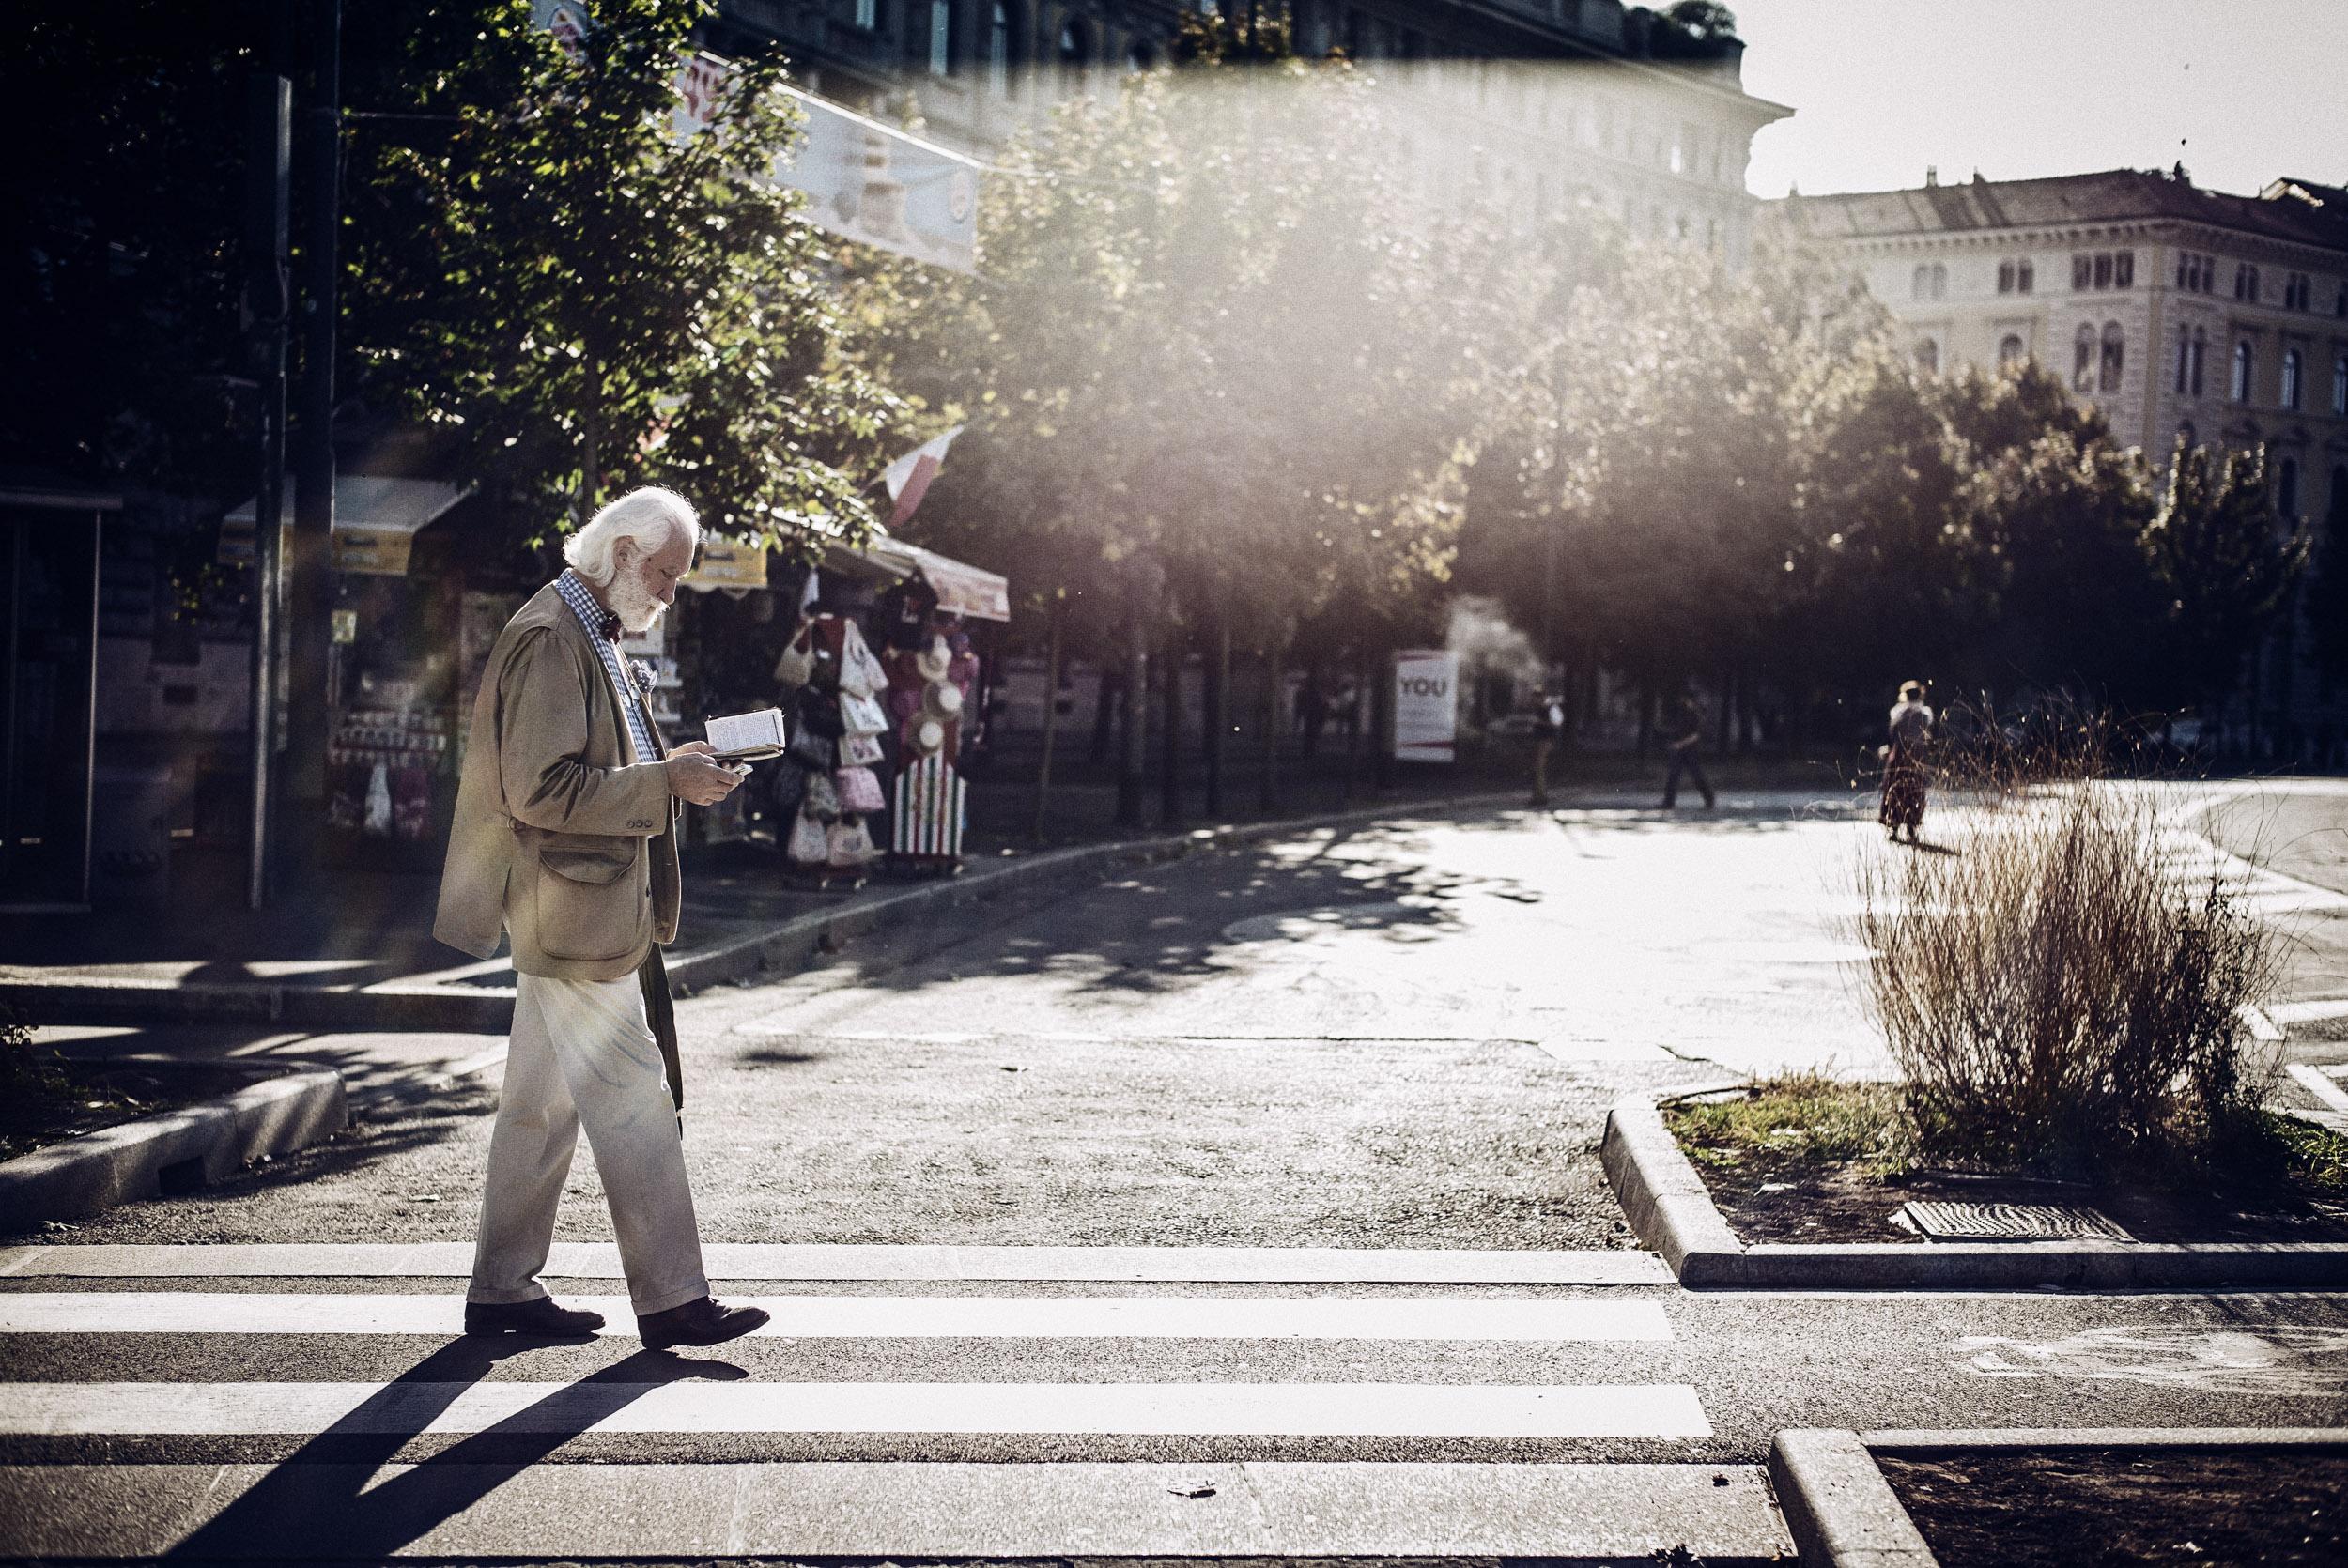 seifertuebler-masterscraft-francesco-maglia-corporate-lifestyle-photography-17.jpg